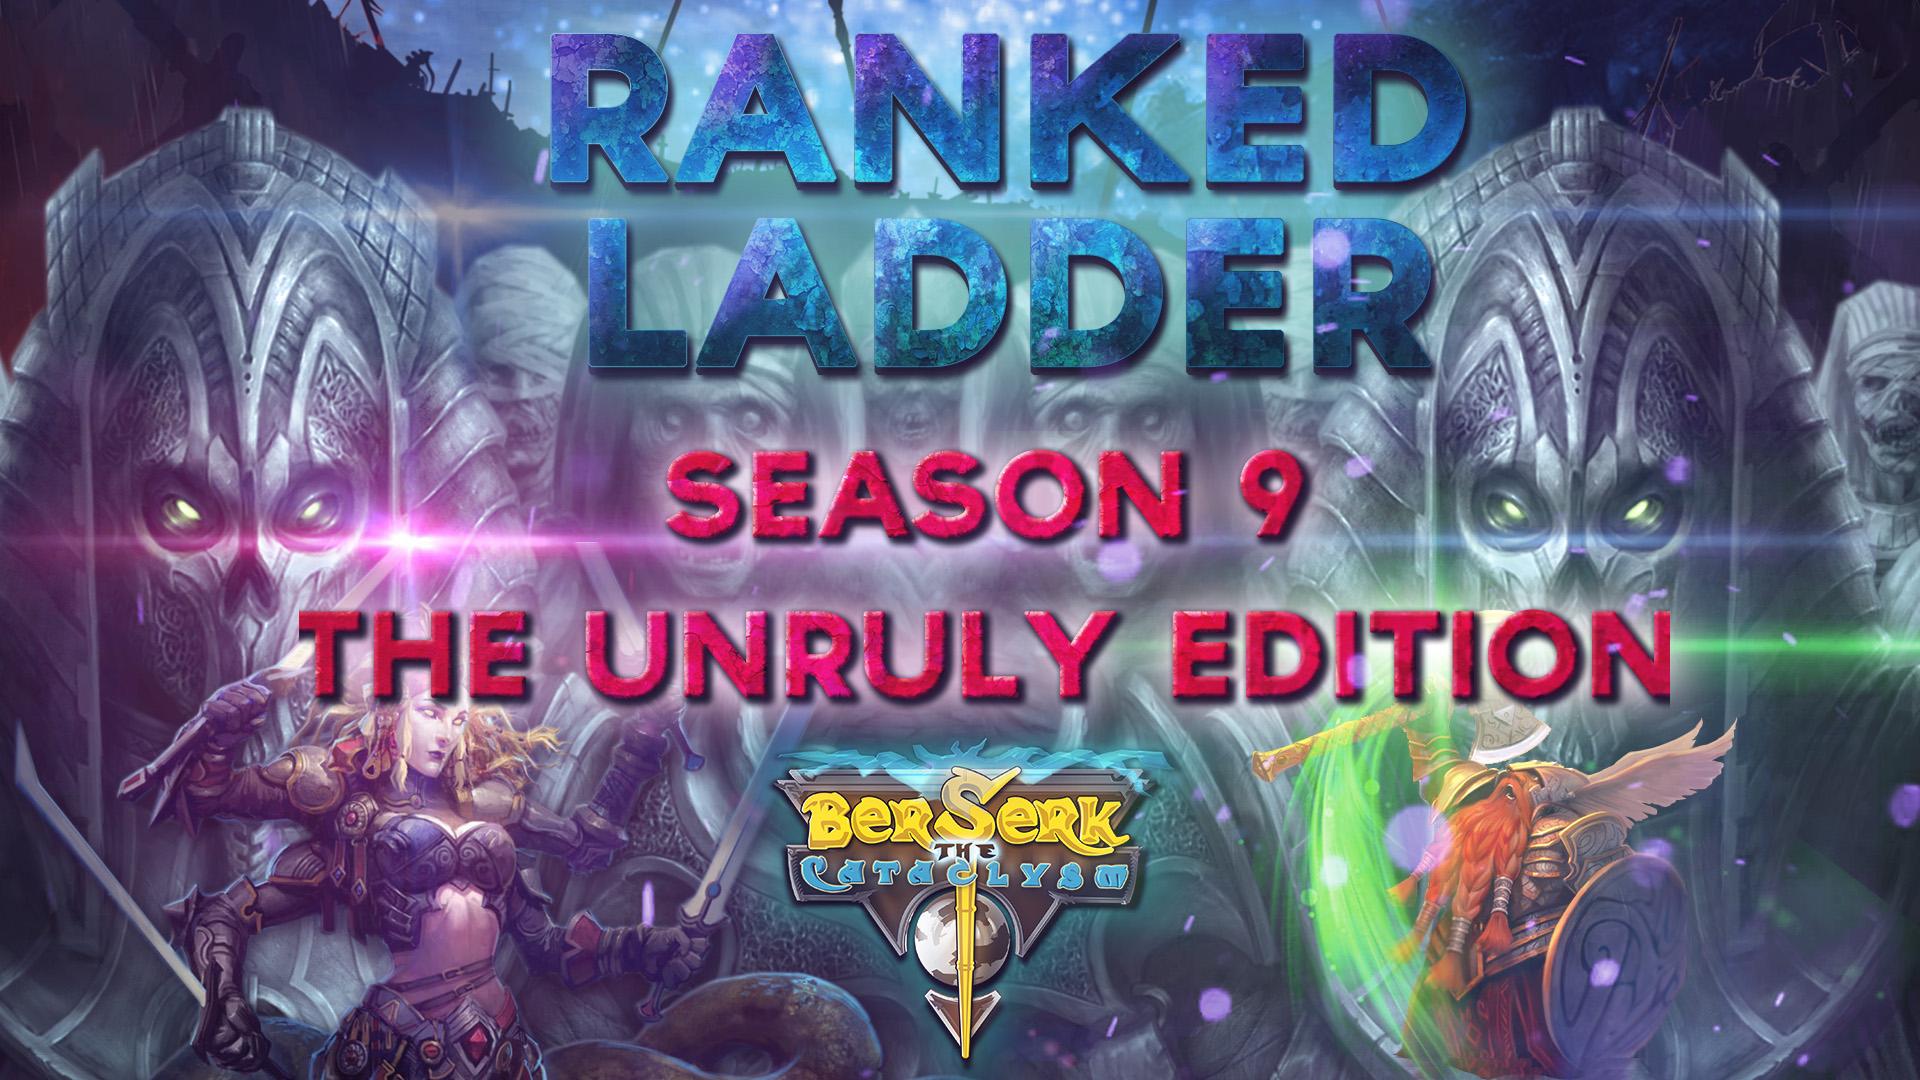 Ranked_LAdder_Season_9_unruly.jpg